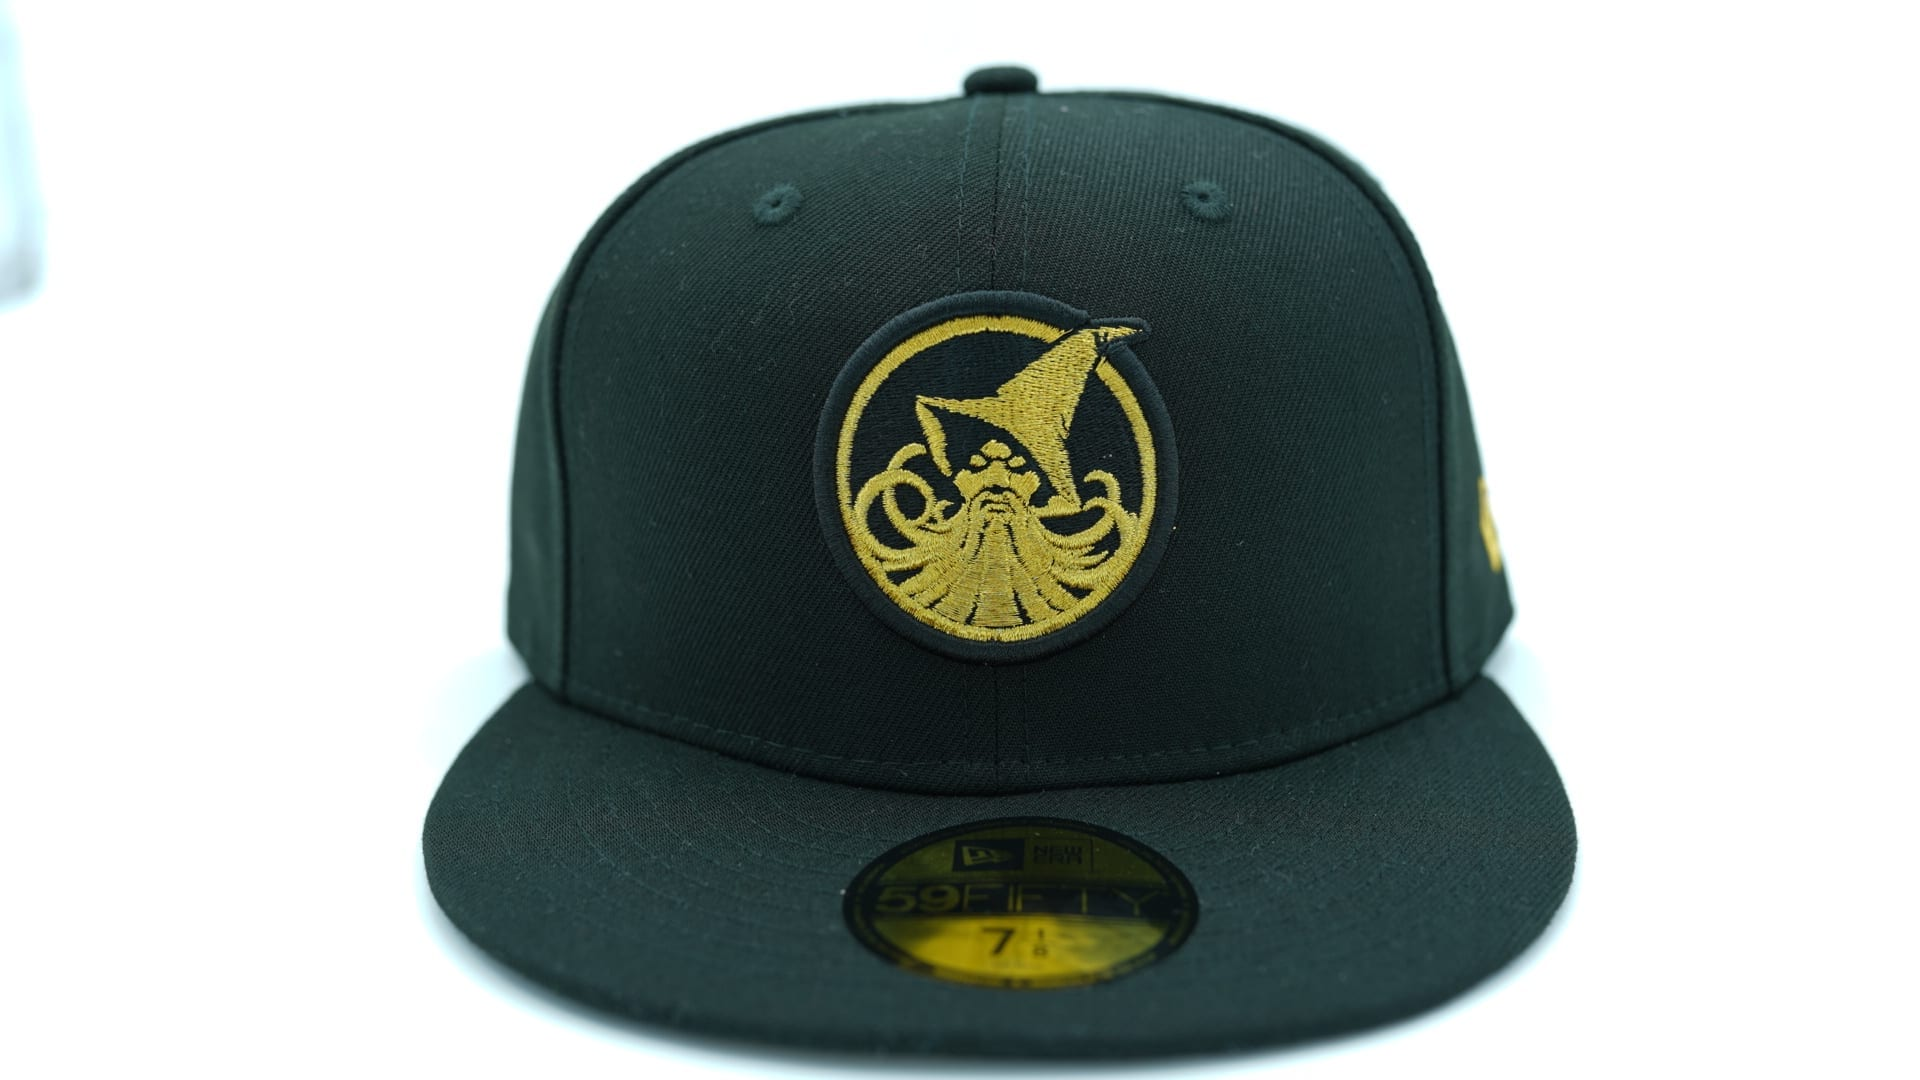 Brooklyn Dodgers Throwback Hat - Hat HD Image Ukjugs.Org 472cfc88b83